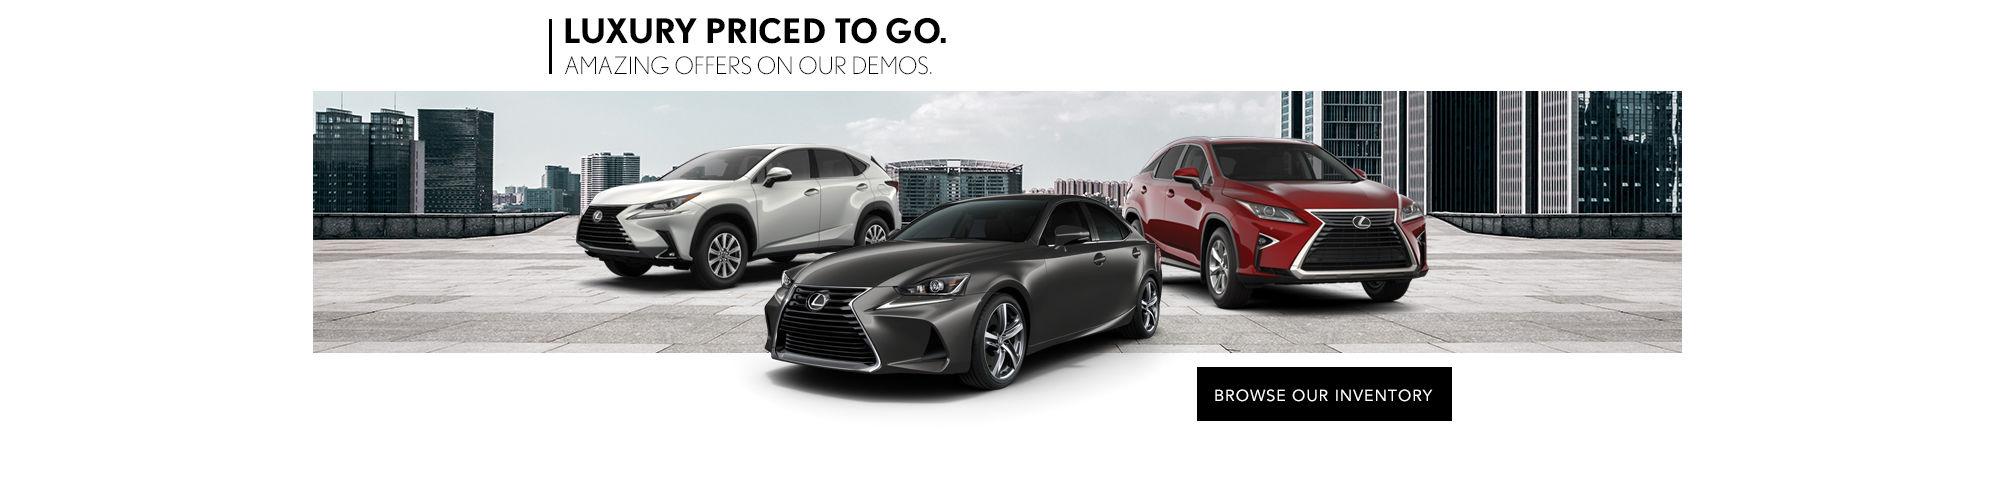 Lexus Demo Sales Event